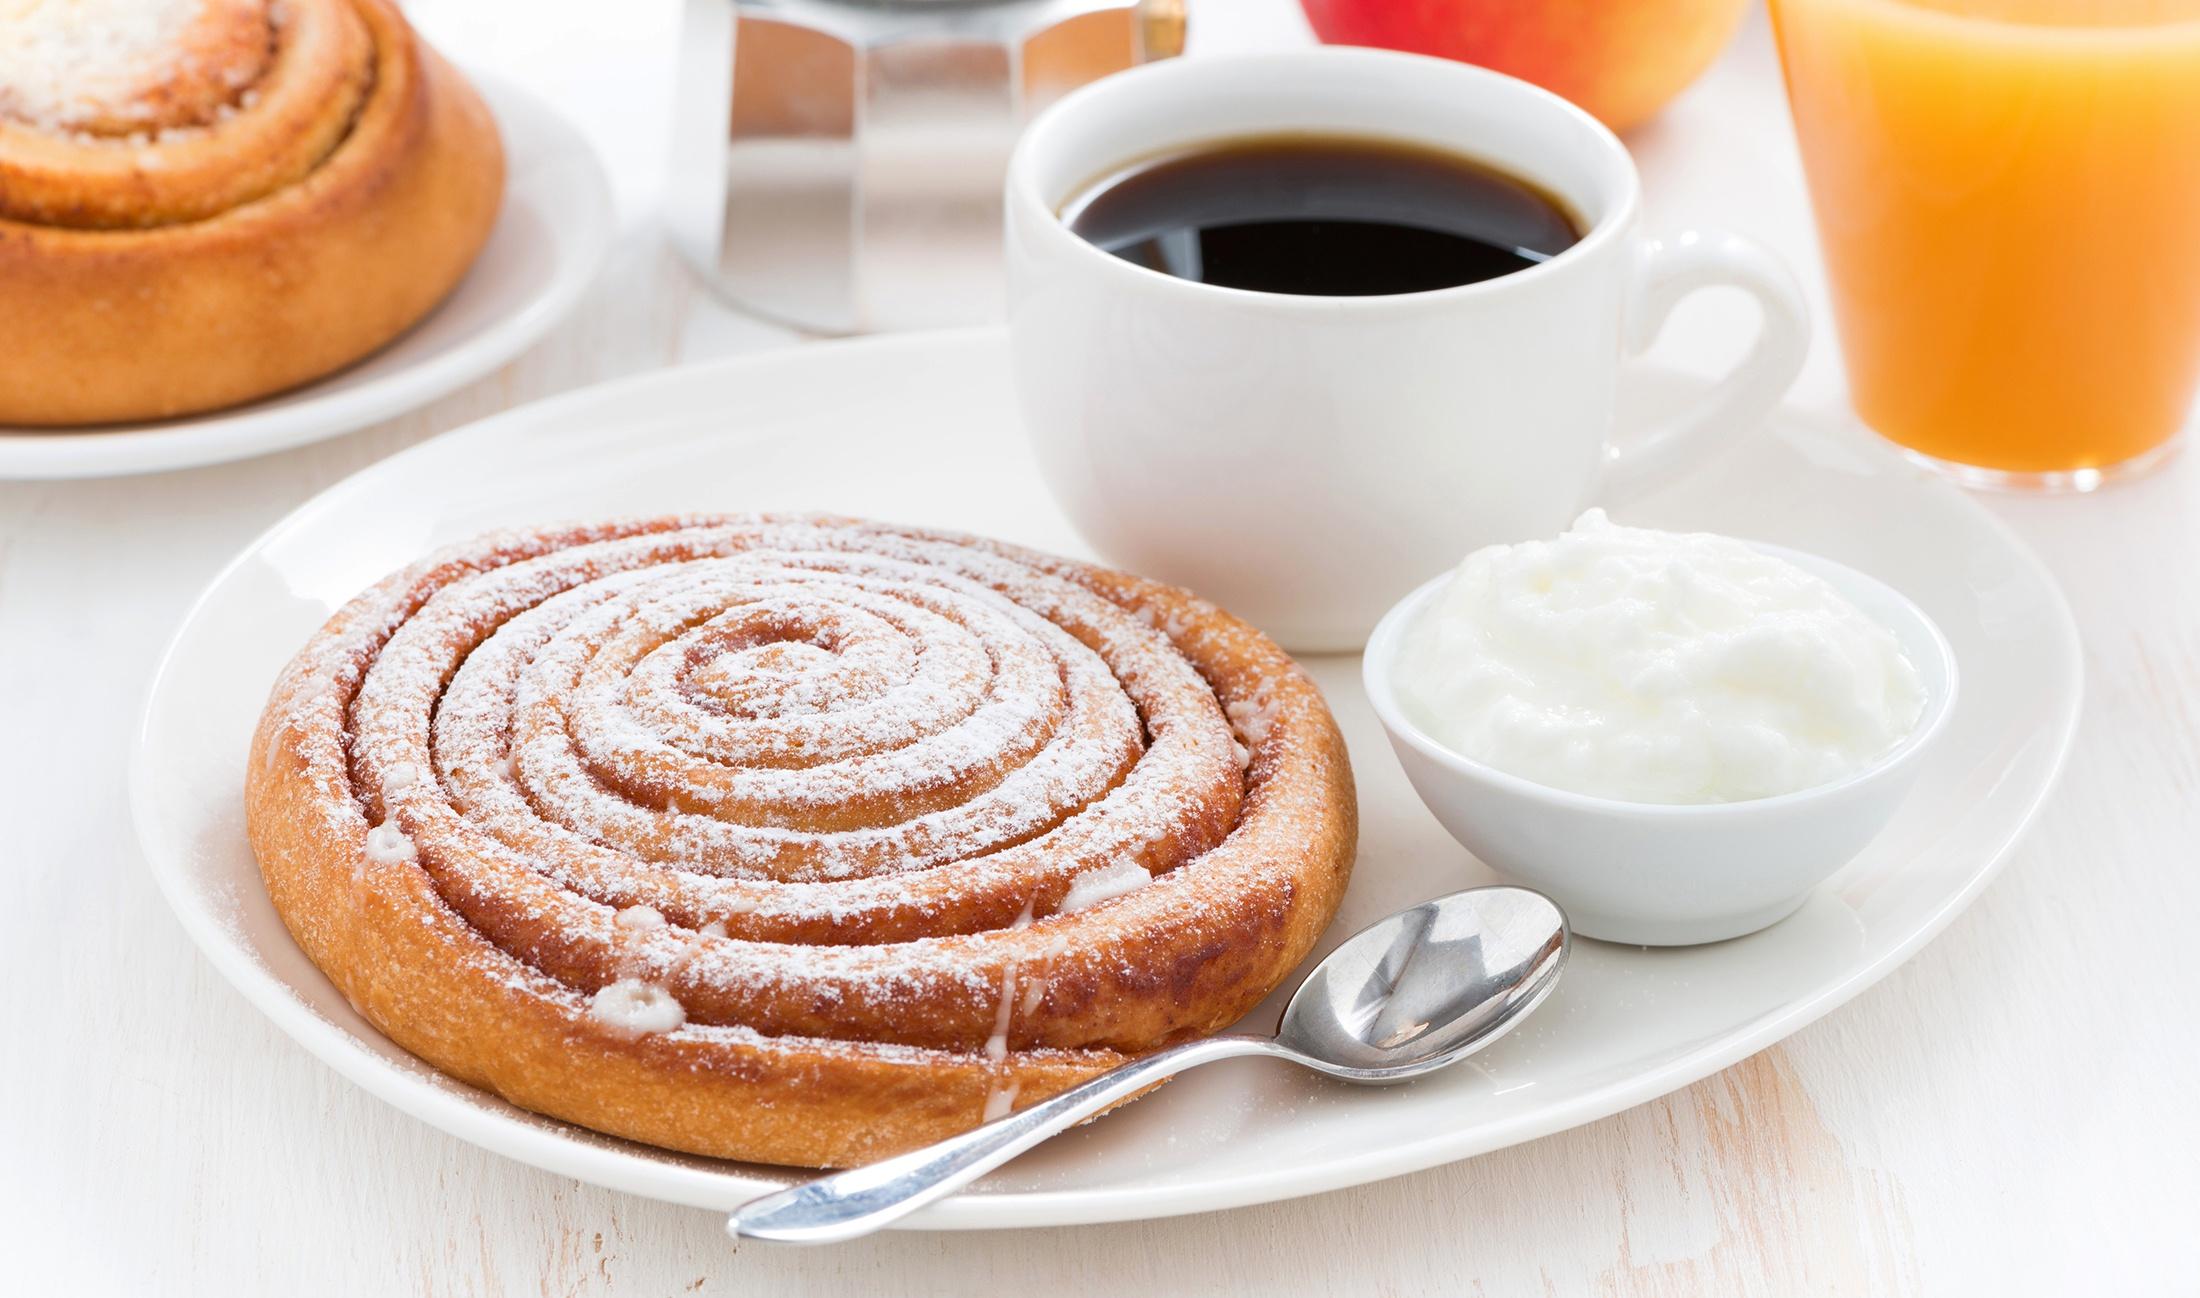 Breakfast Coffee Cup Still Life Viennoiserie 2200x1298